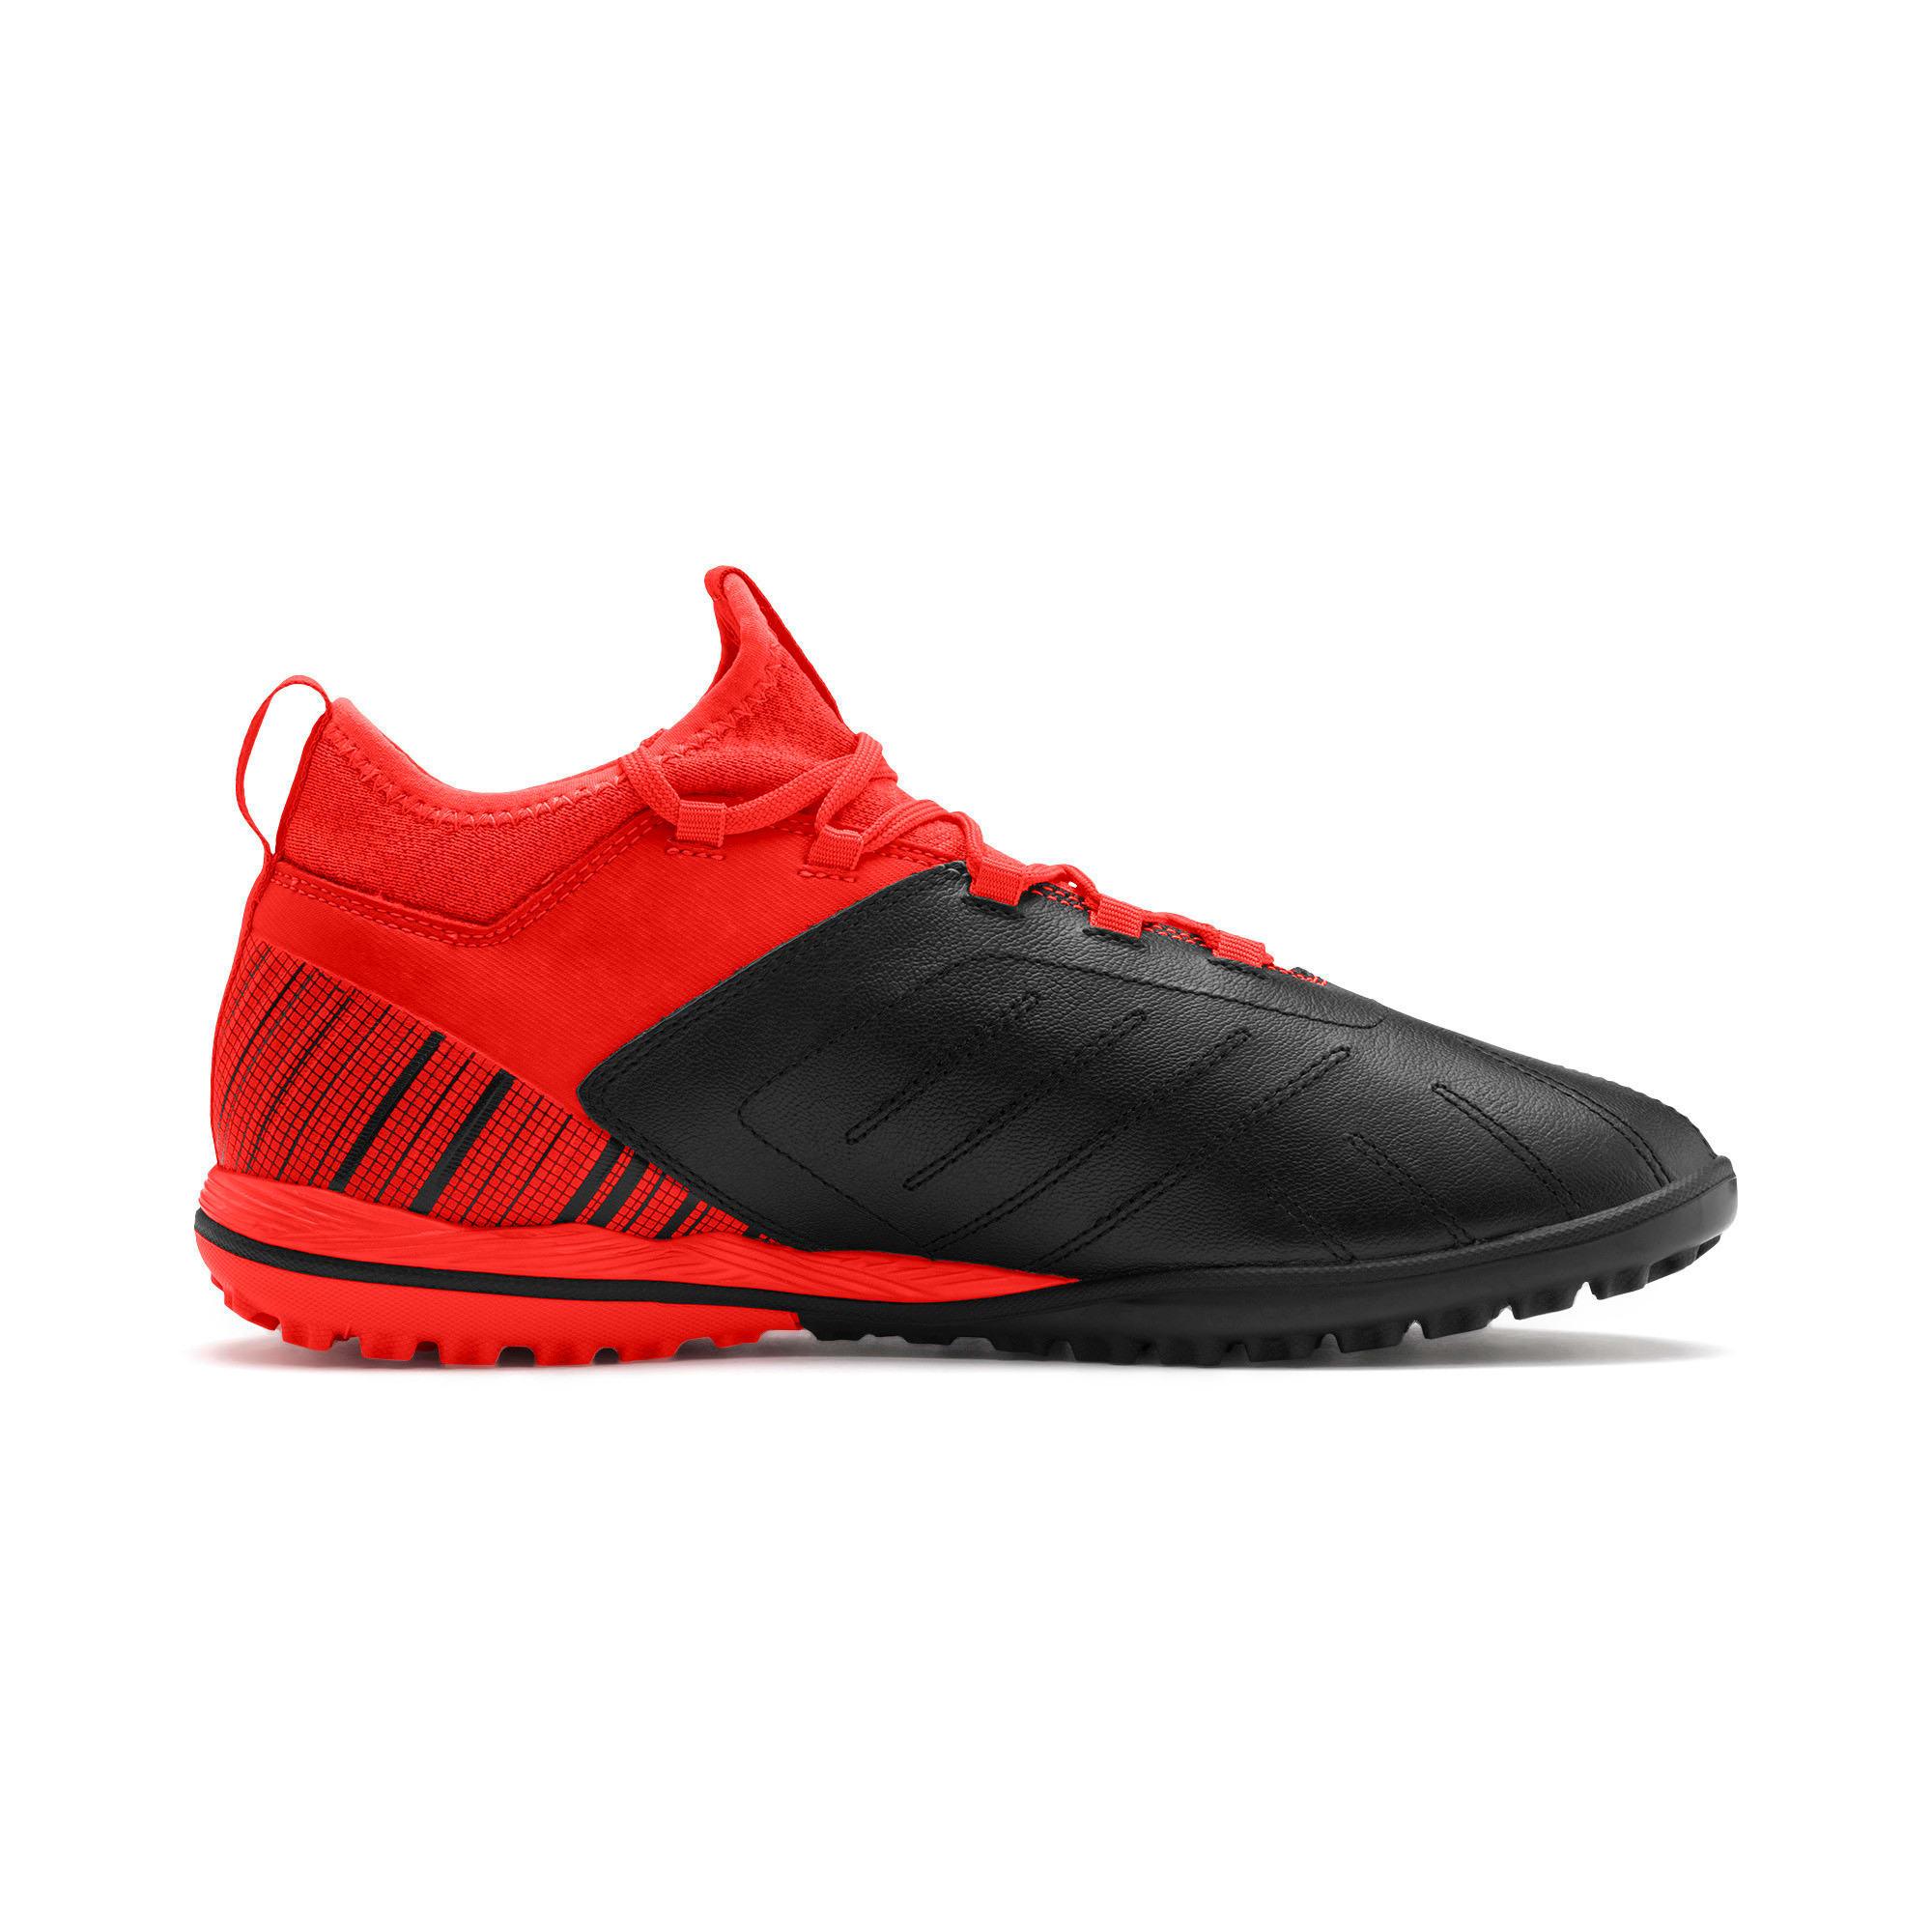 Thumbnail 6 of PUMA ONE 5.3 TT Men's Soccer Shoes, Black-Nrgy Red-Aged Silver, medium